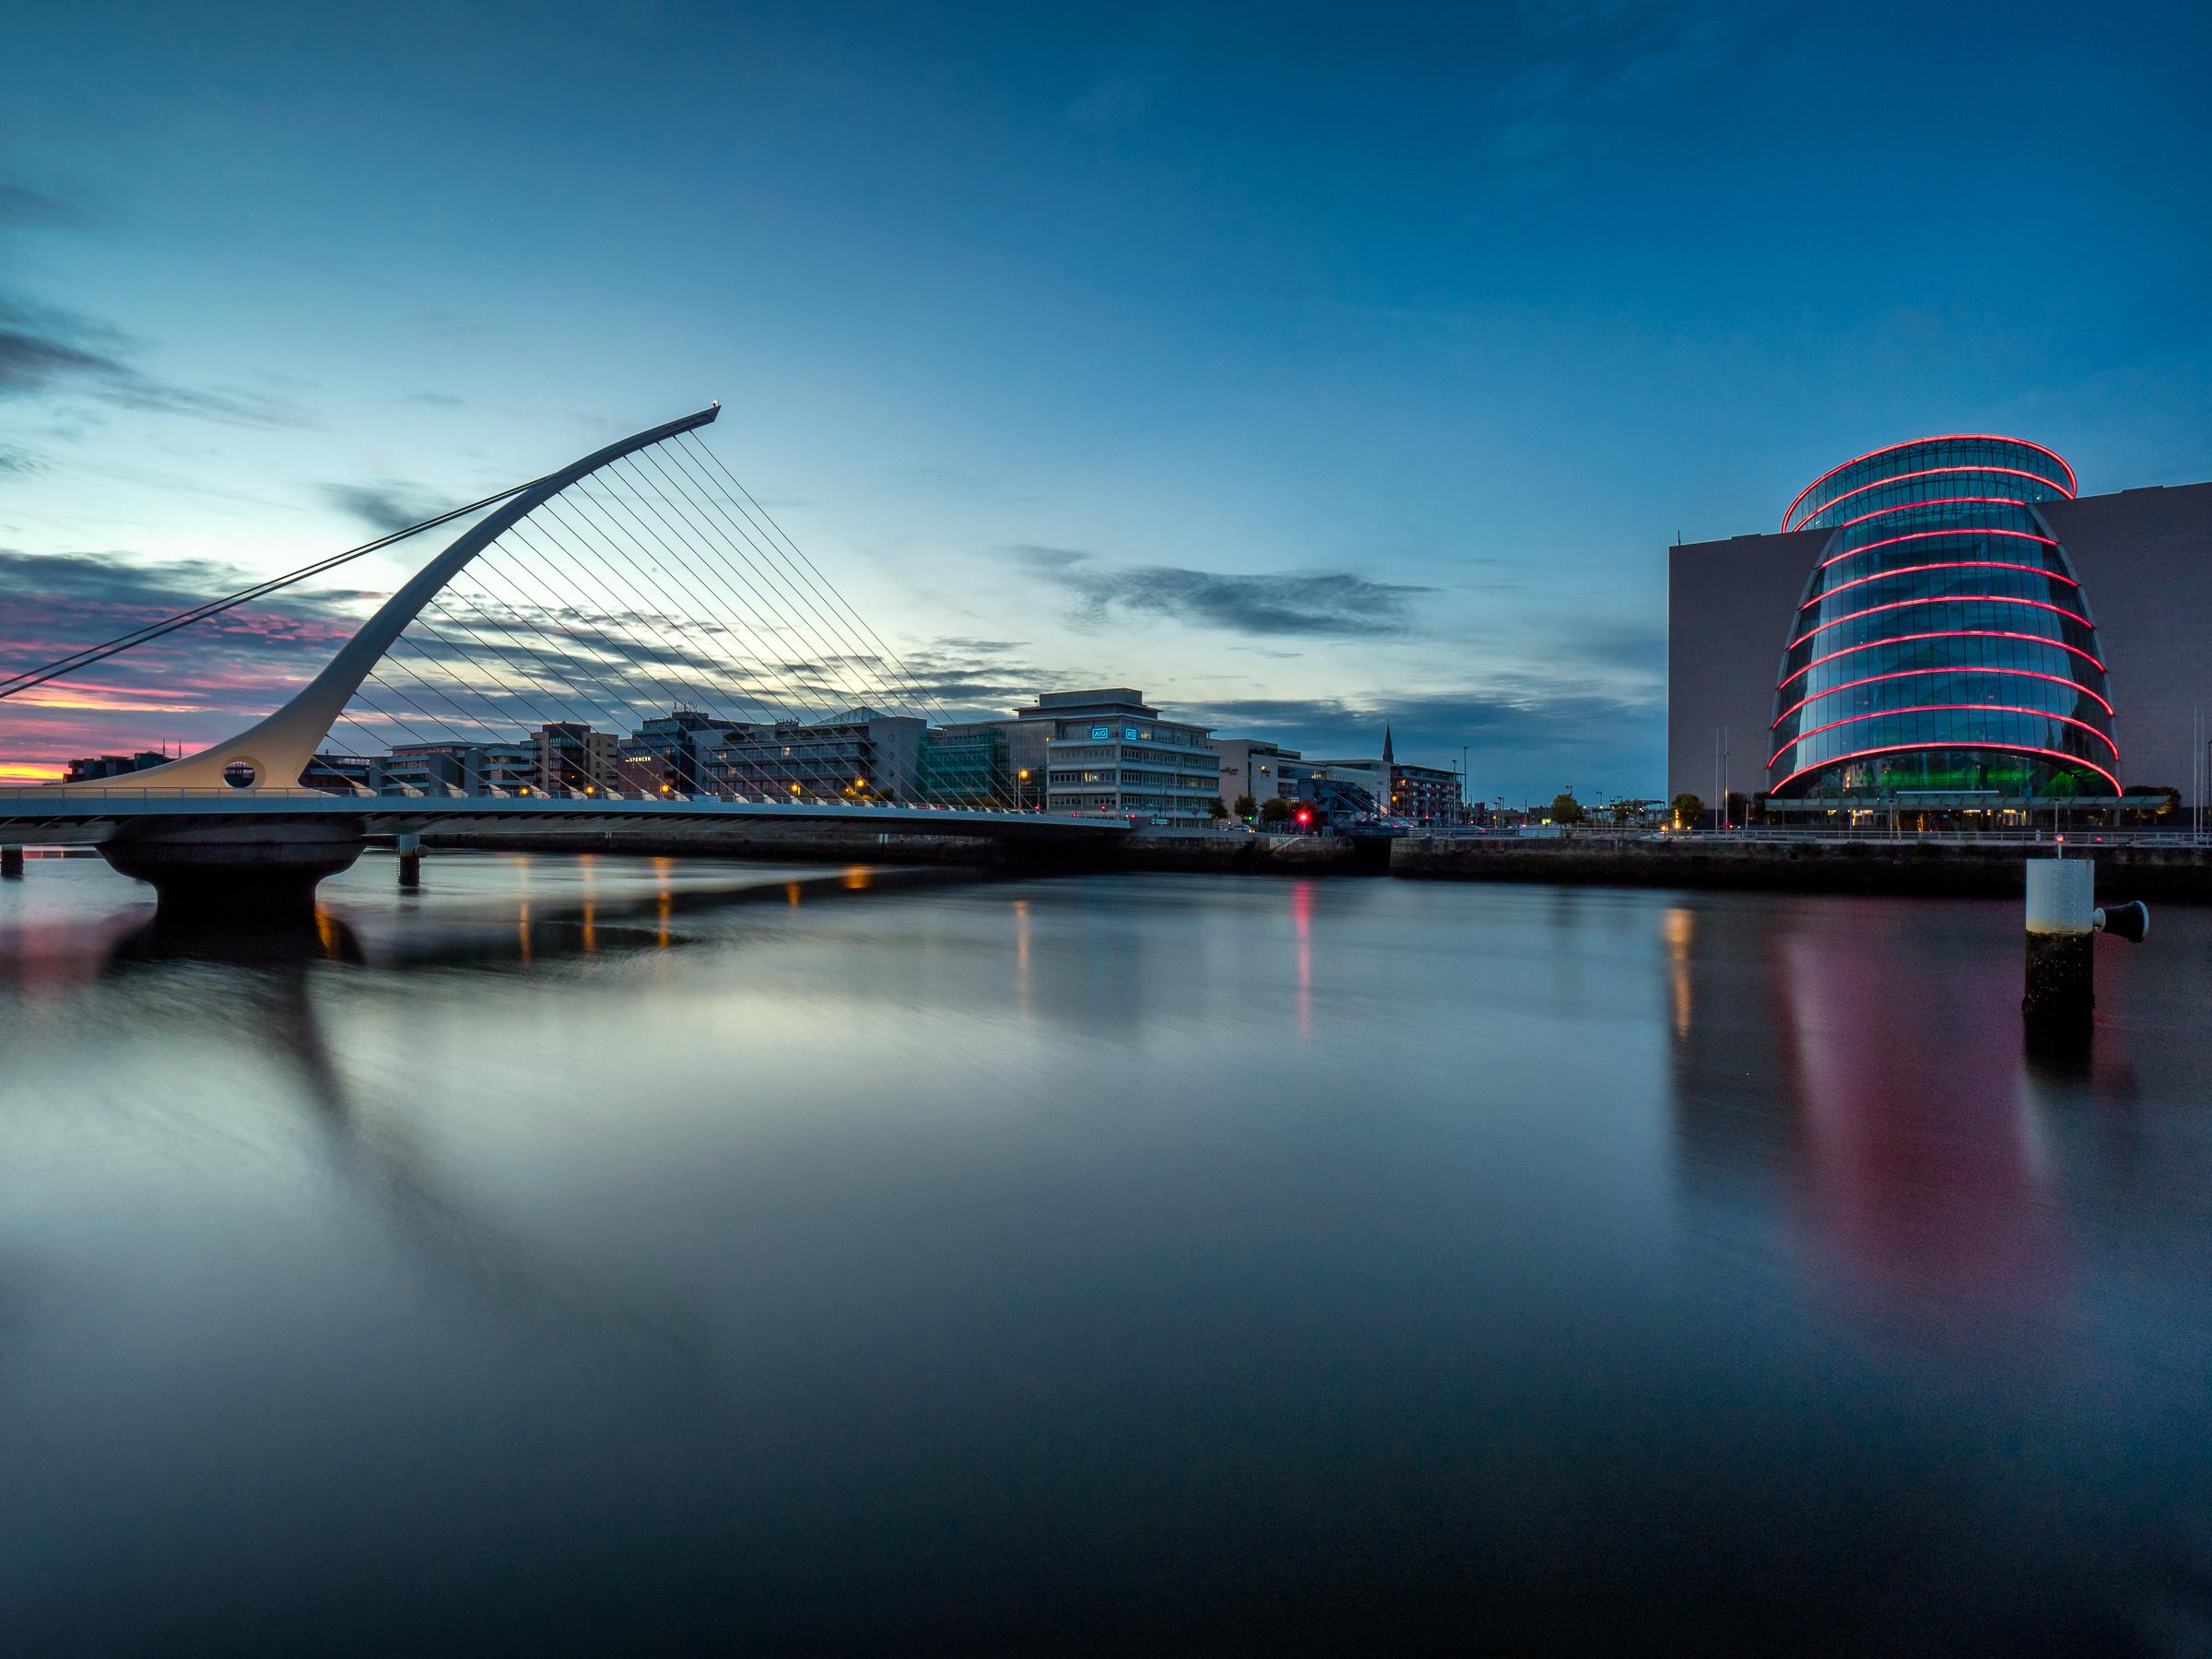 Samuel Beckett Bridge in Dublin Ireland